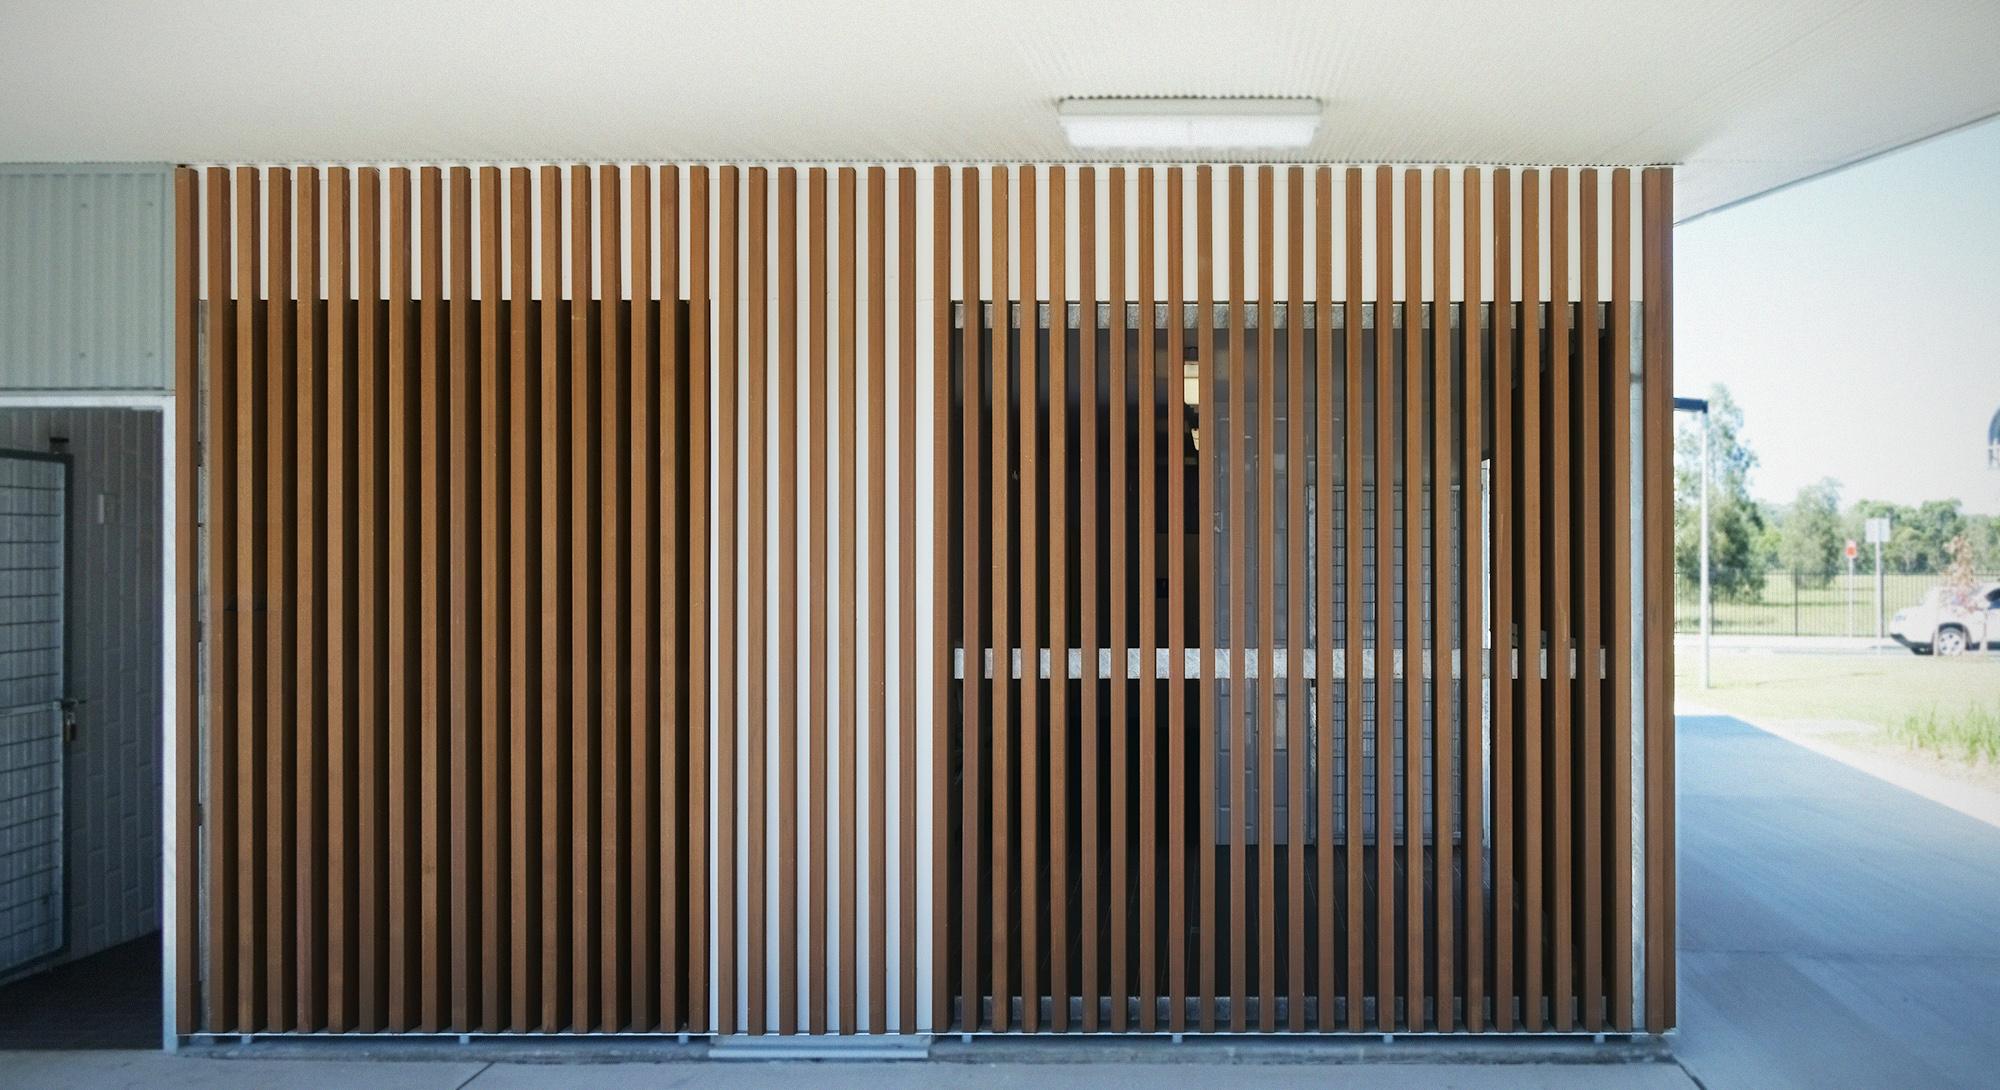 LAKE CATHIE PUBLIC SCHOOL - Composite Timber Decking | Composite